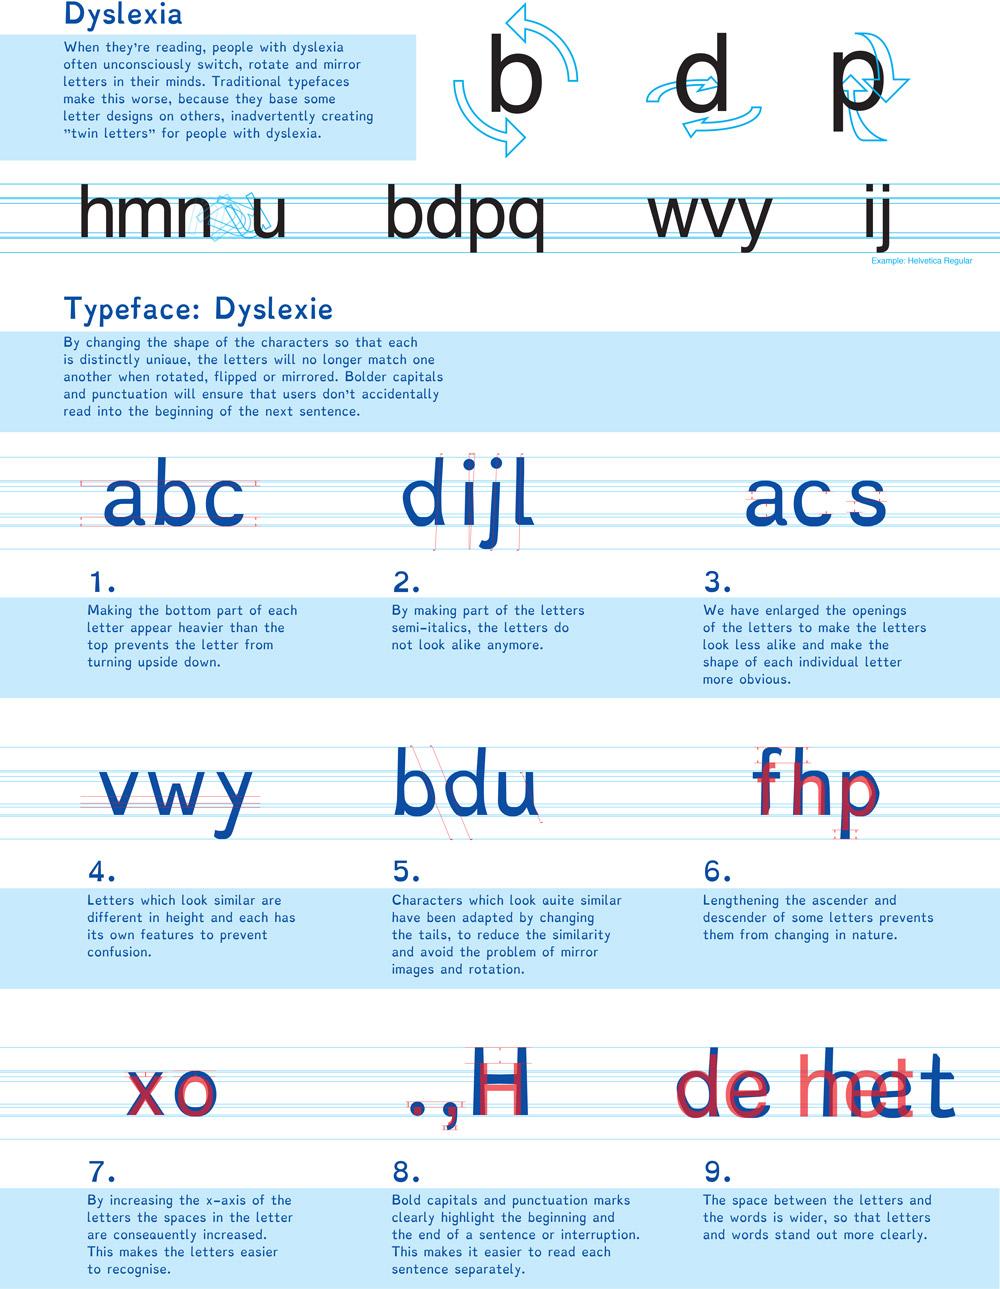 Dyslexie-typeface-by-Christian-Boer-dezeen_468_2_1000.jpg